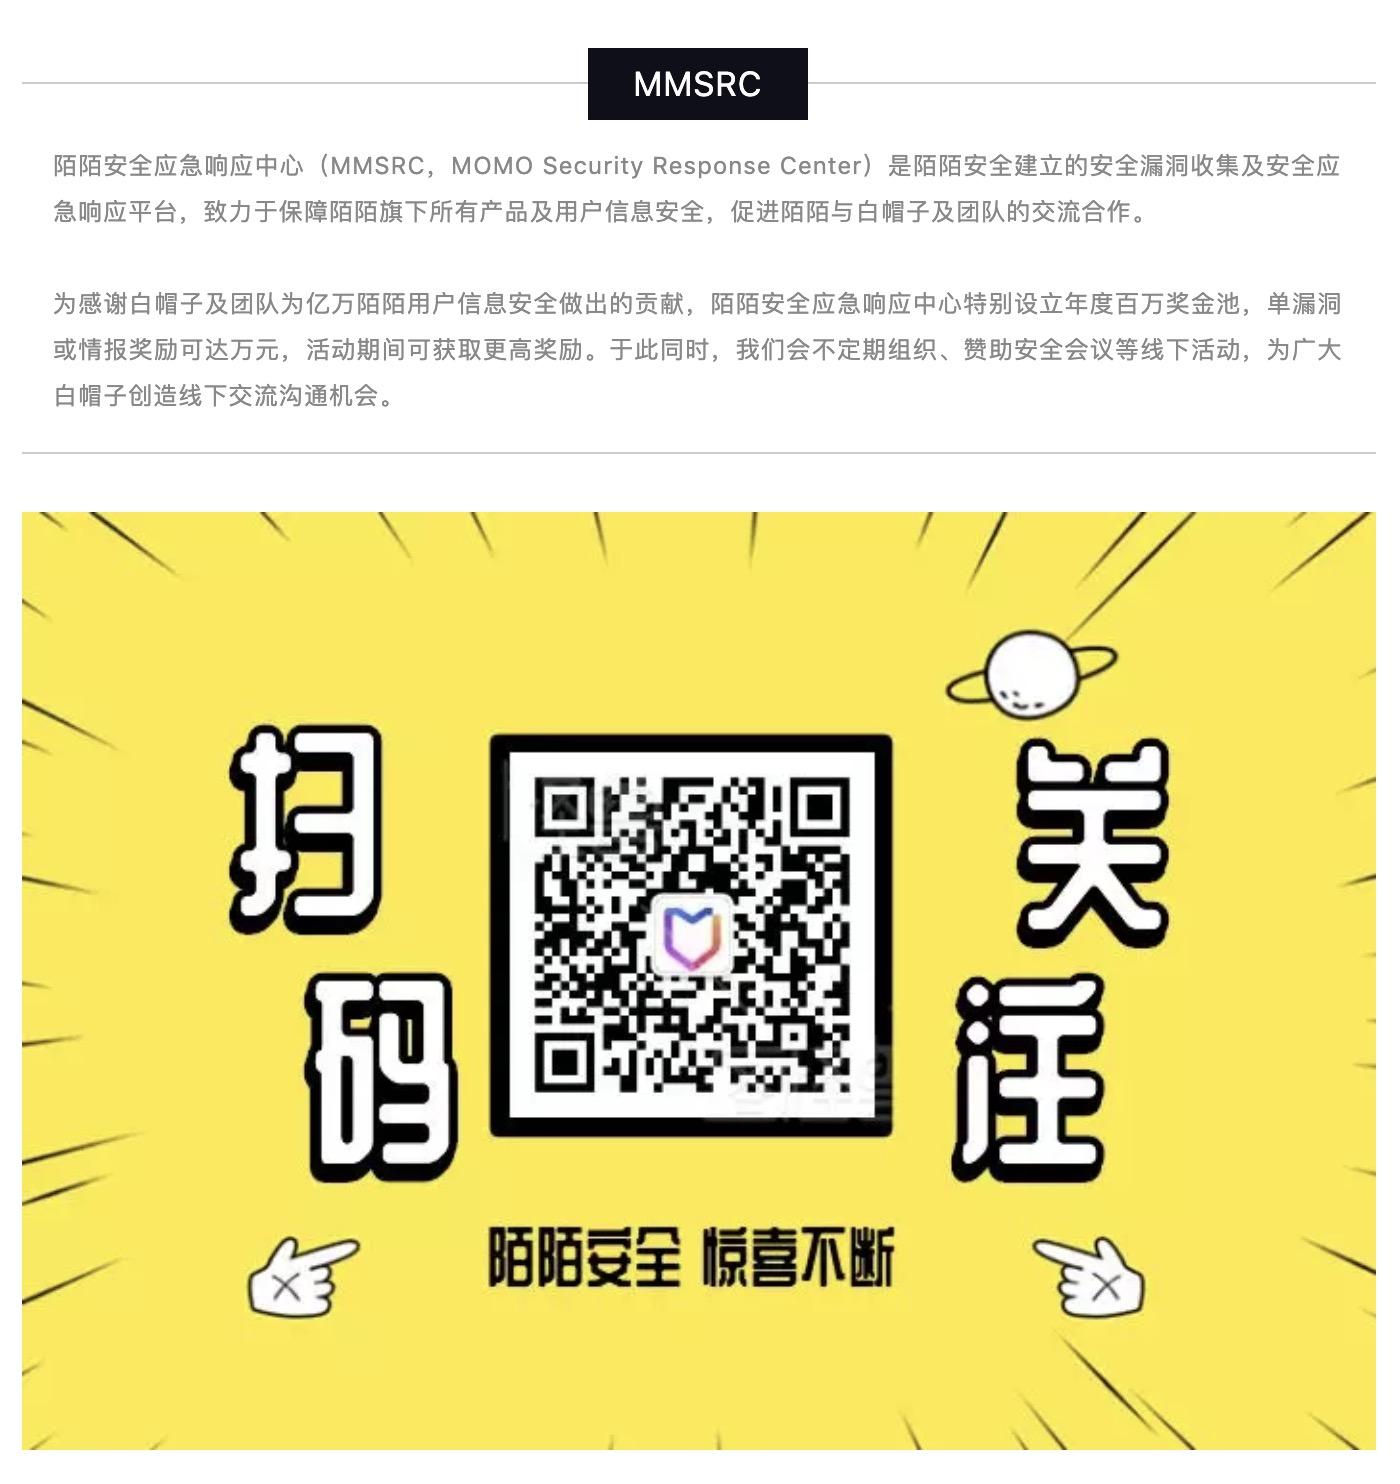 https://momo-mmsrc.oss-cn-hangzhou.aliyuncs.com/img-ea7006aa-e865-36e3-8df9-f3f6341010a1.jpeg